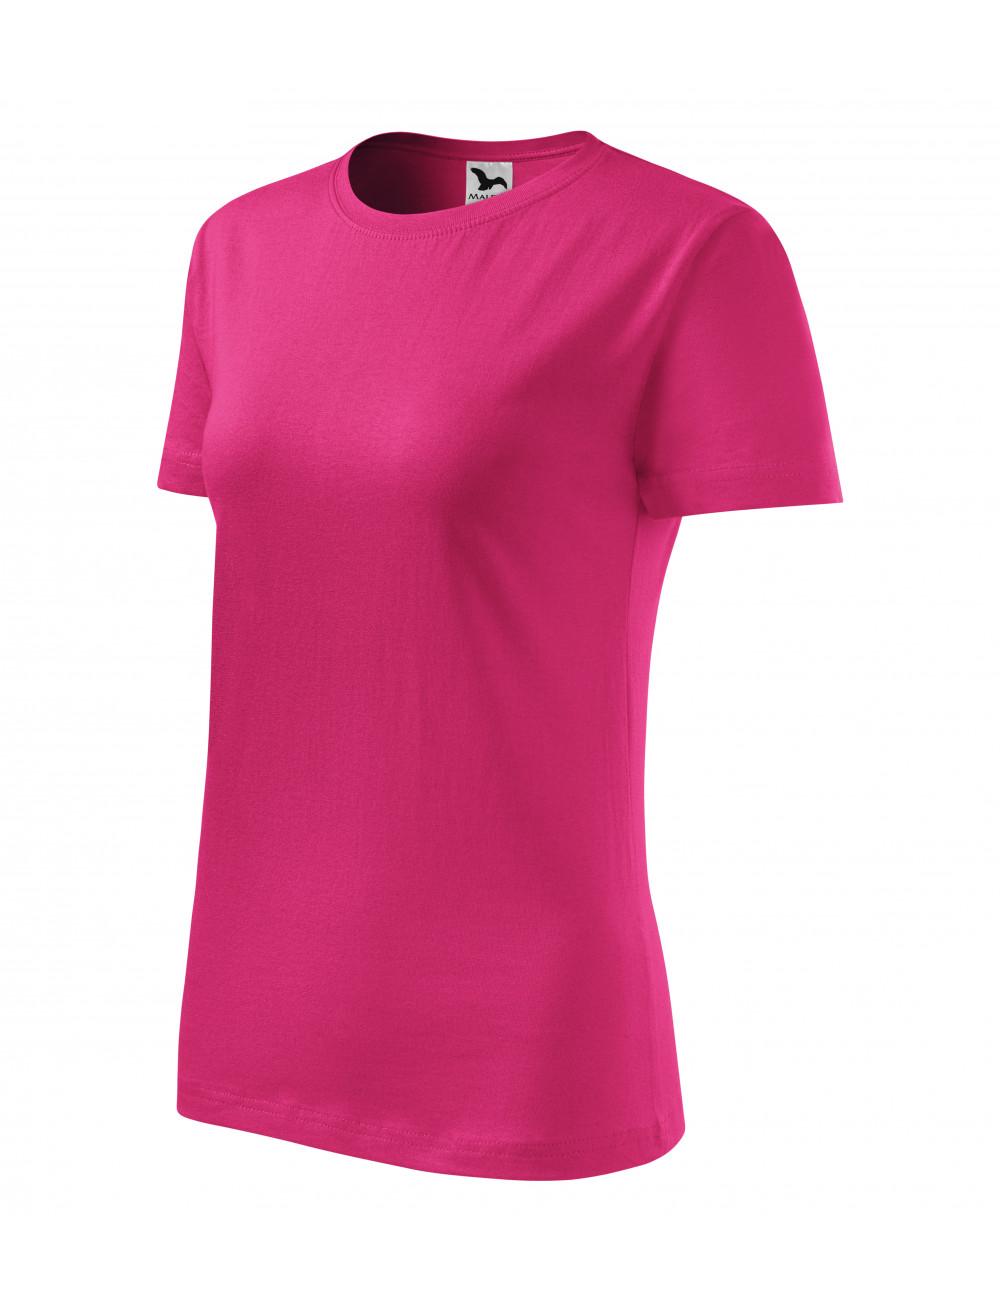 Adler MALFINI Koszulka damska Classic New 133 czerwień purpurowa